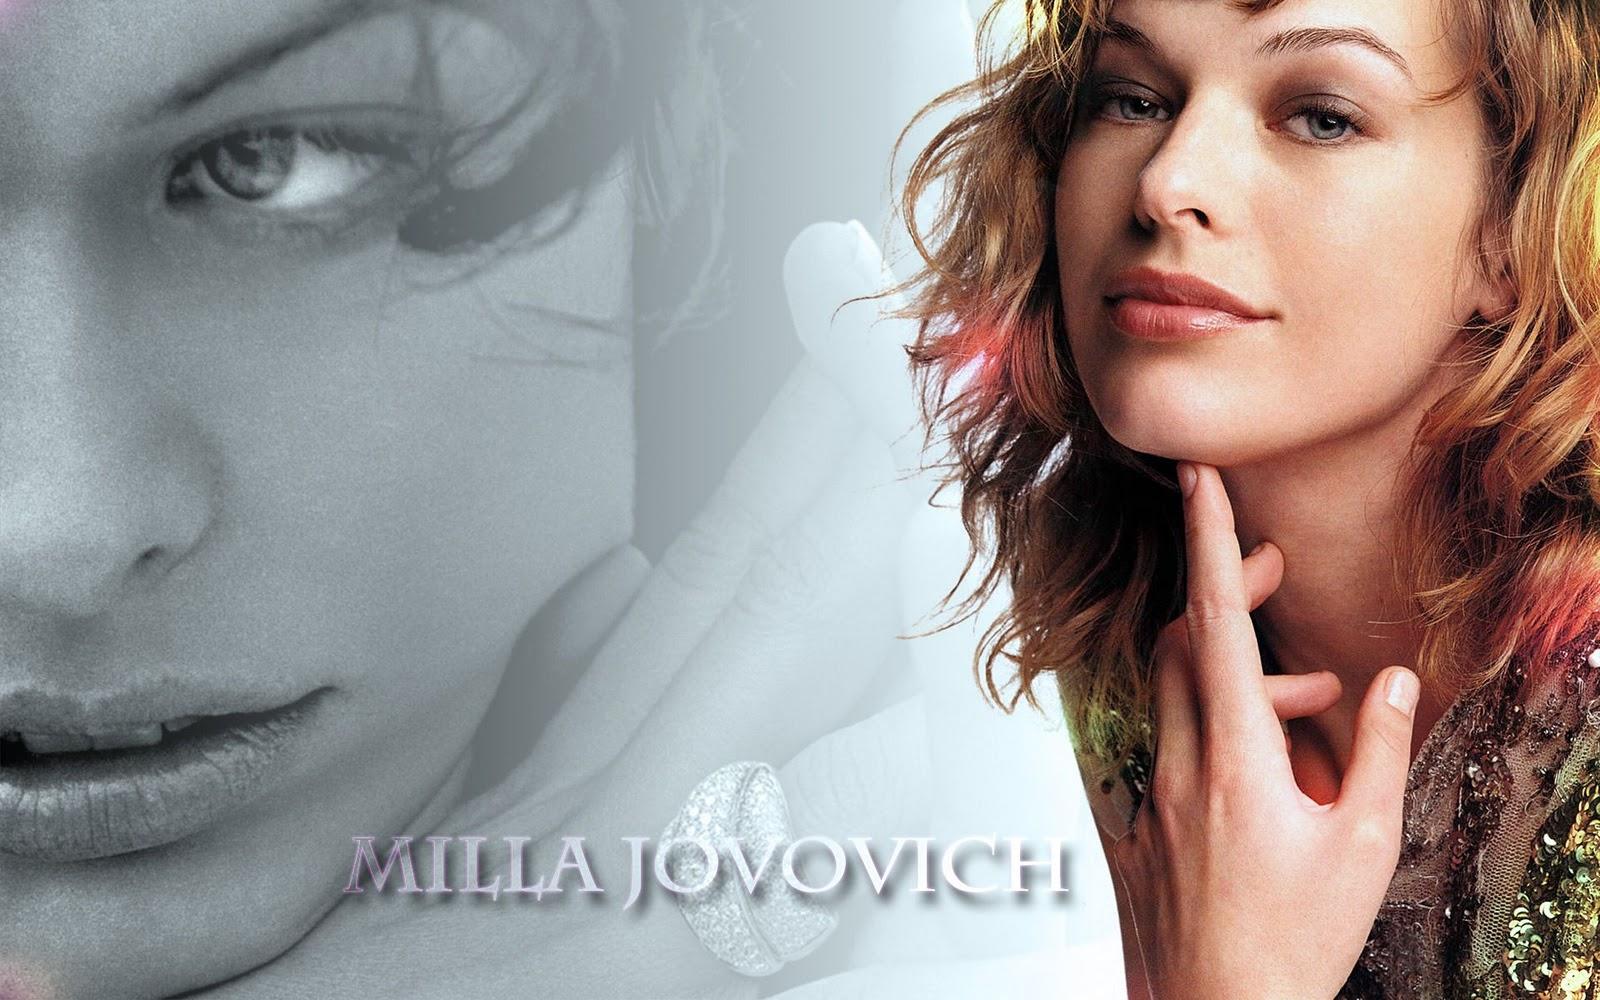 http://2.bp.blogspot.com/_gx7OZdt7Uhs/TPIFm2EOviI/AAAAAAAAFRE/ltOmZnc567w/s1600/Milla+Jovovich+Sexy+Wallpaper.jpg